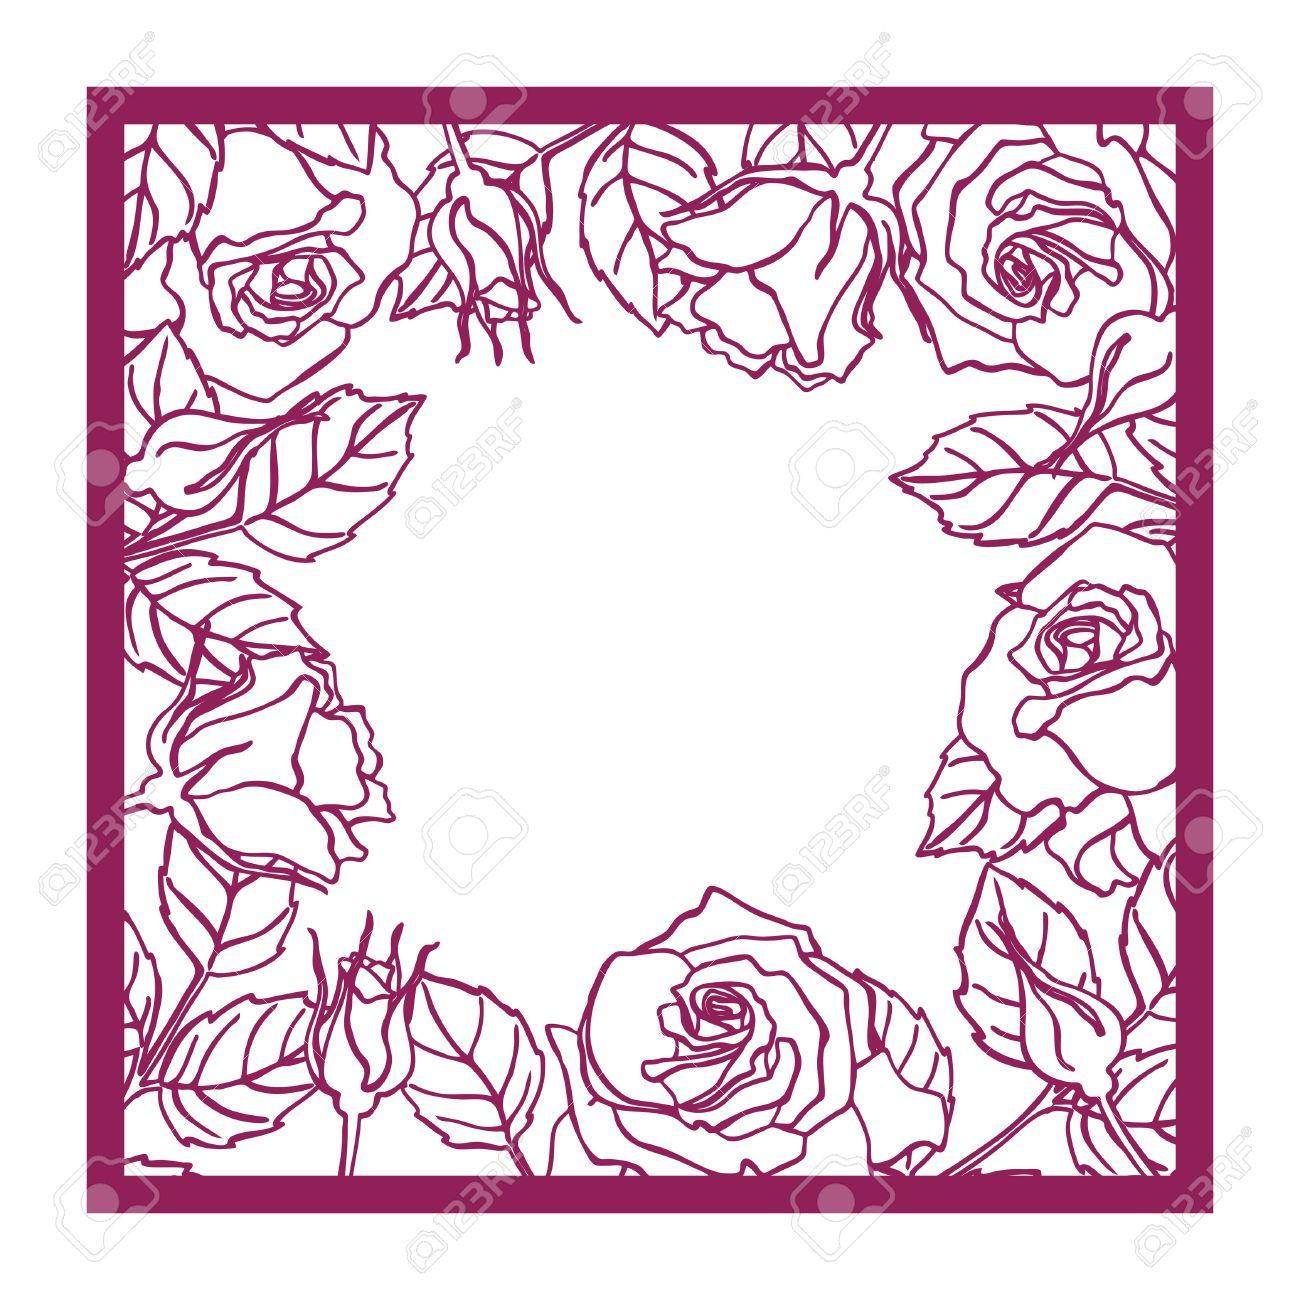 Laser cut vector rose square frame cutout pattern silhouette with laser cut vector rose square frame cutout pattern silhouette with flower and leaves die cut paper voltagebd Choice Image